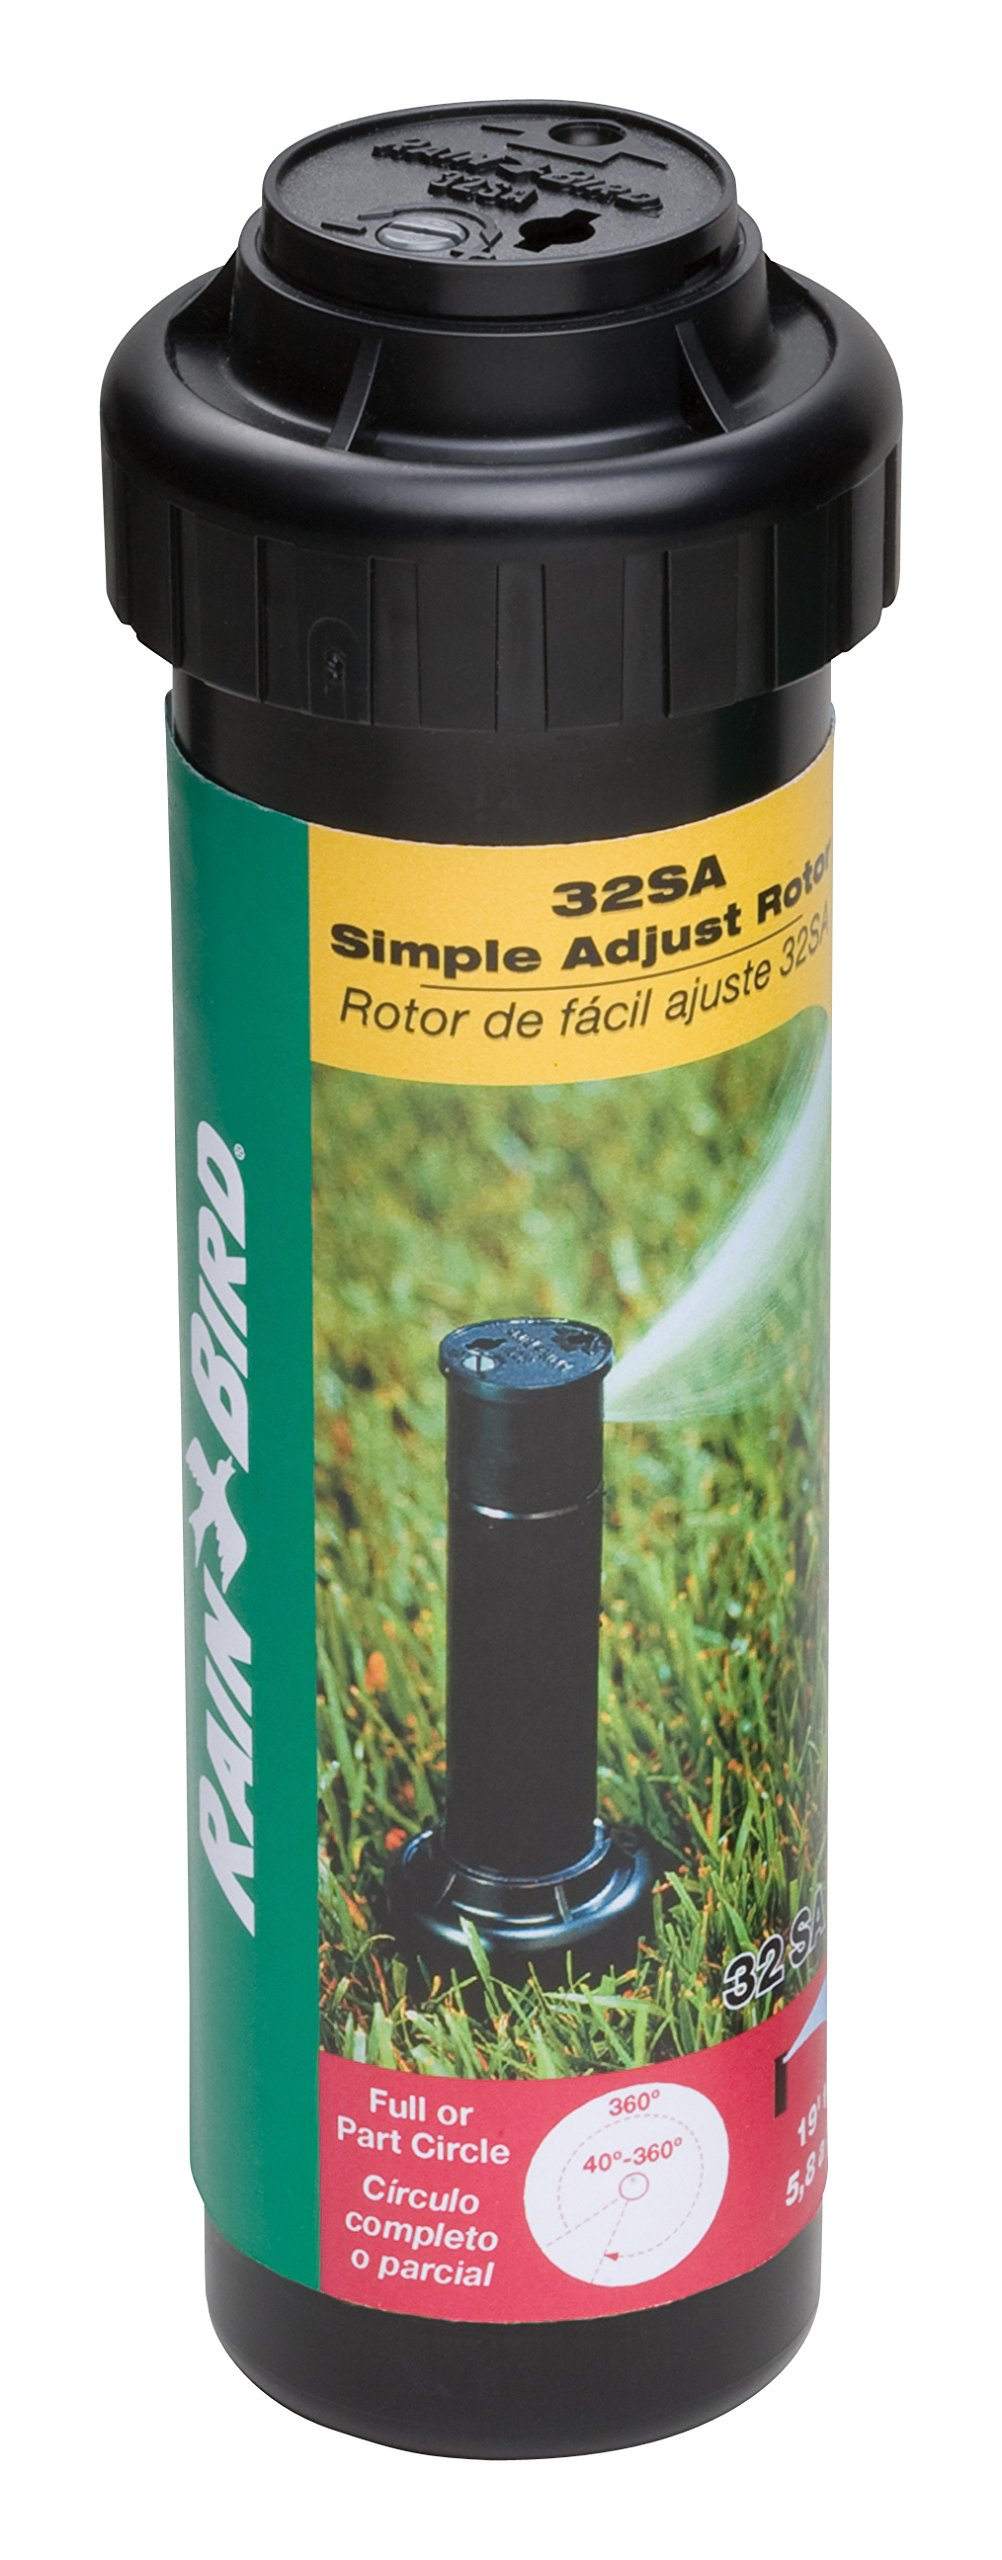 Rain Bird 32SA Simple Adjust Gear Drive Rotor, 40° - 360° Pattern, 19' - 32' Spray Distance